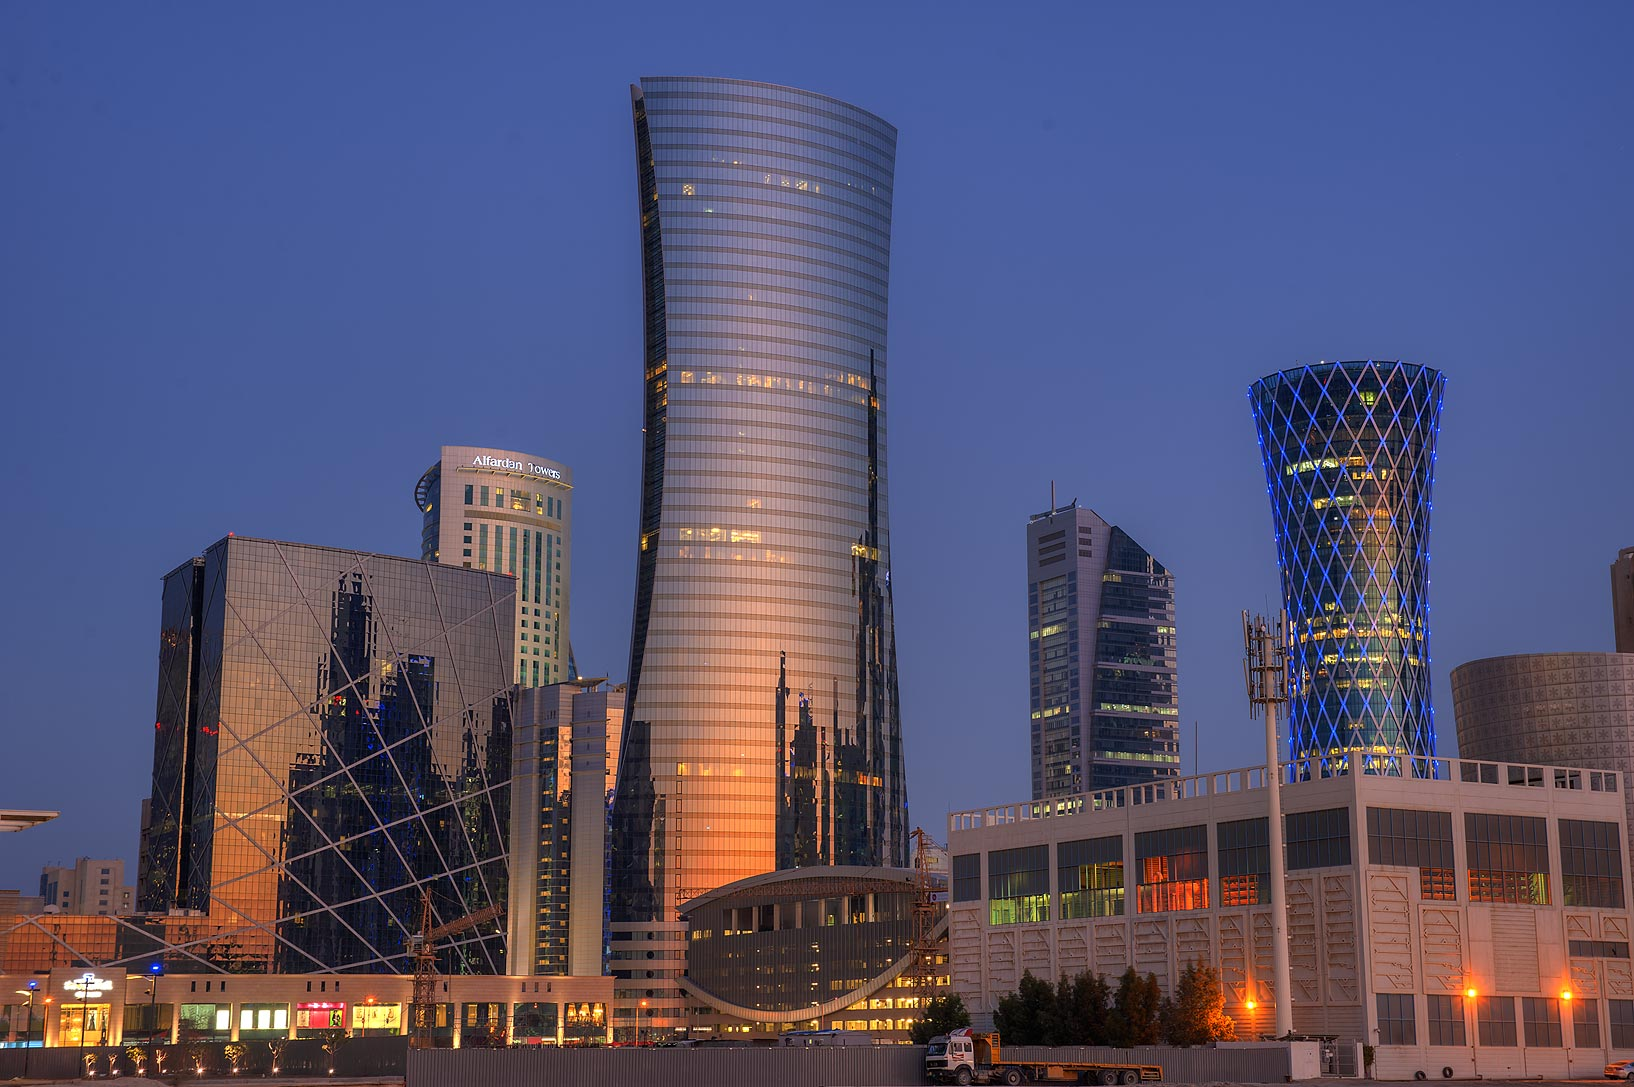 Qatar Navigation Tower (Qatar Gas)